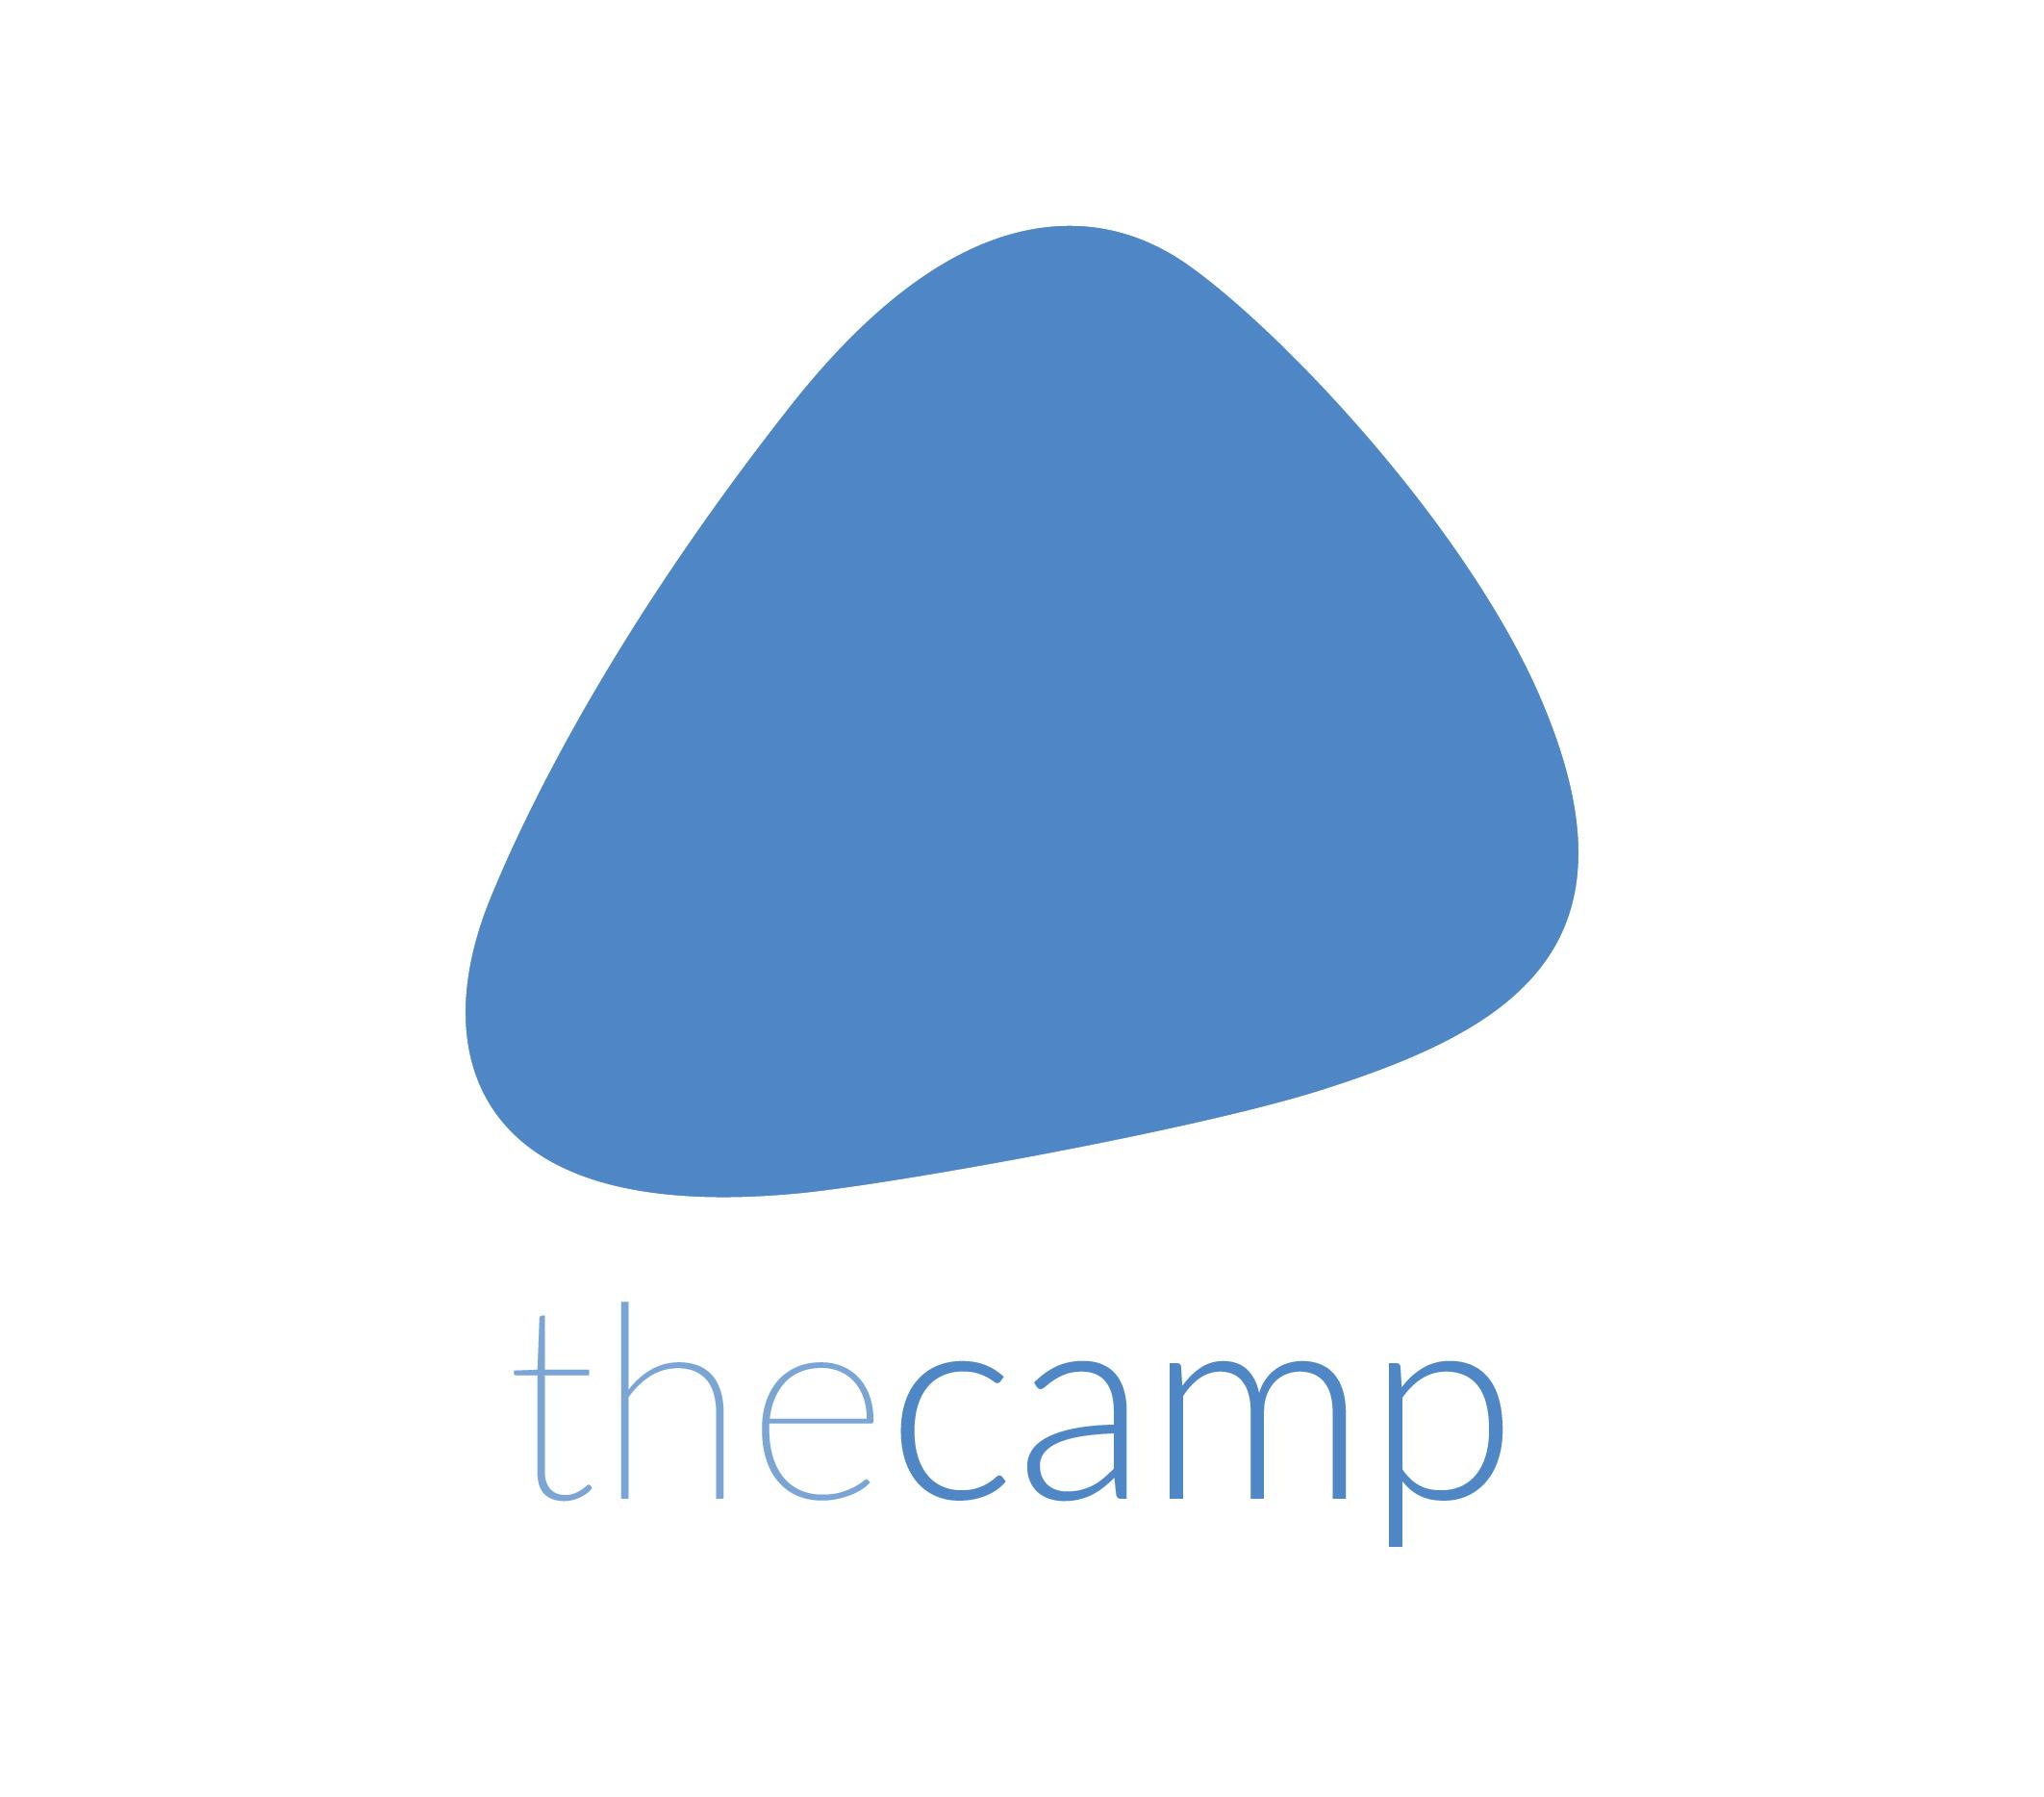 logo_thecamp-blue.jpg